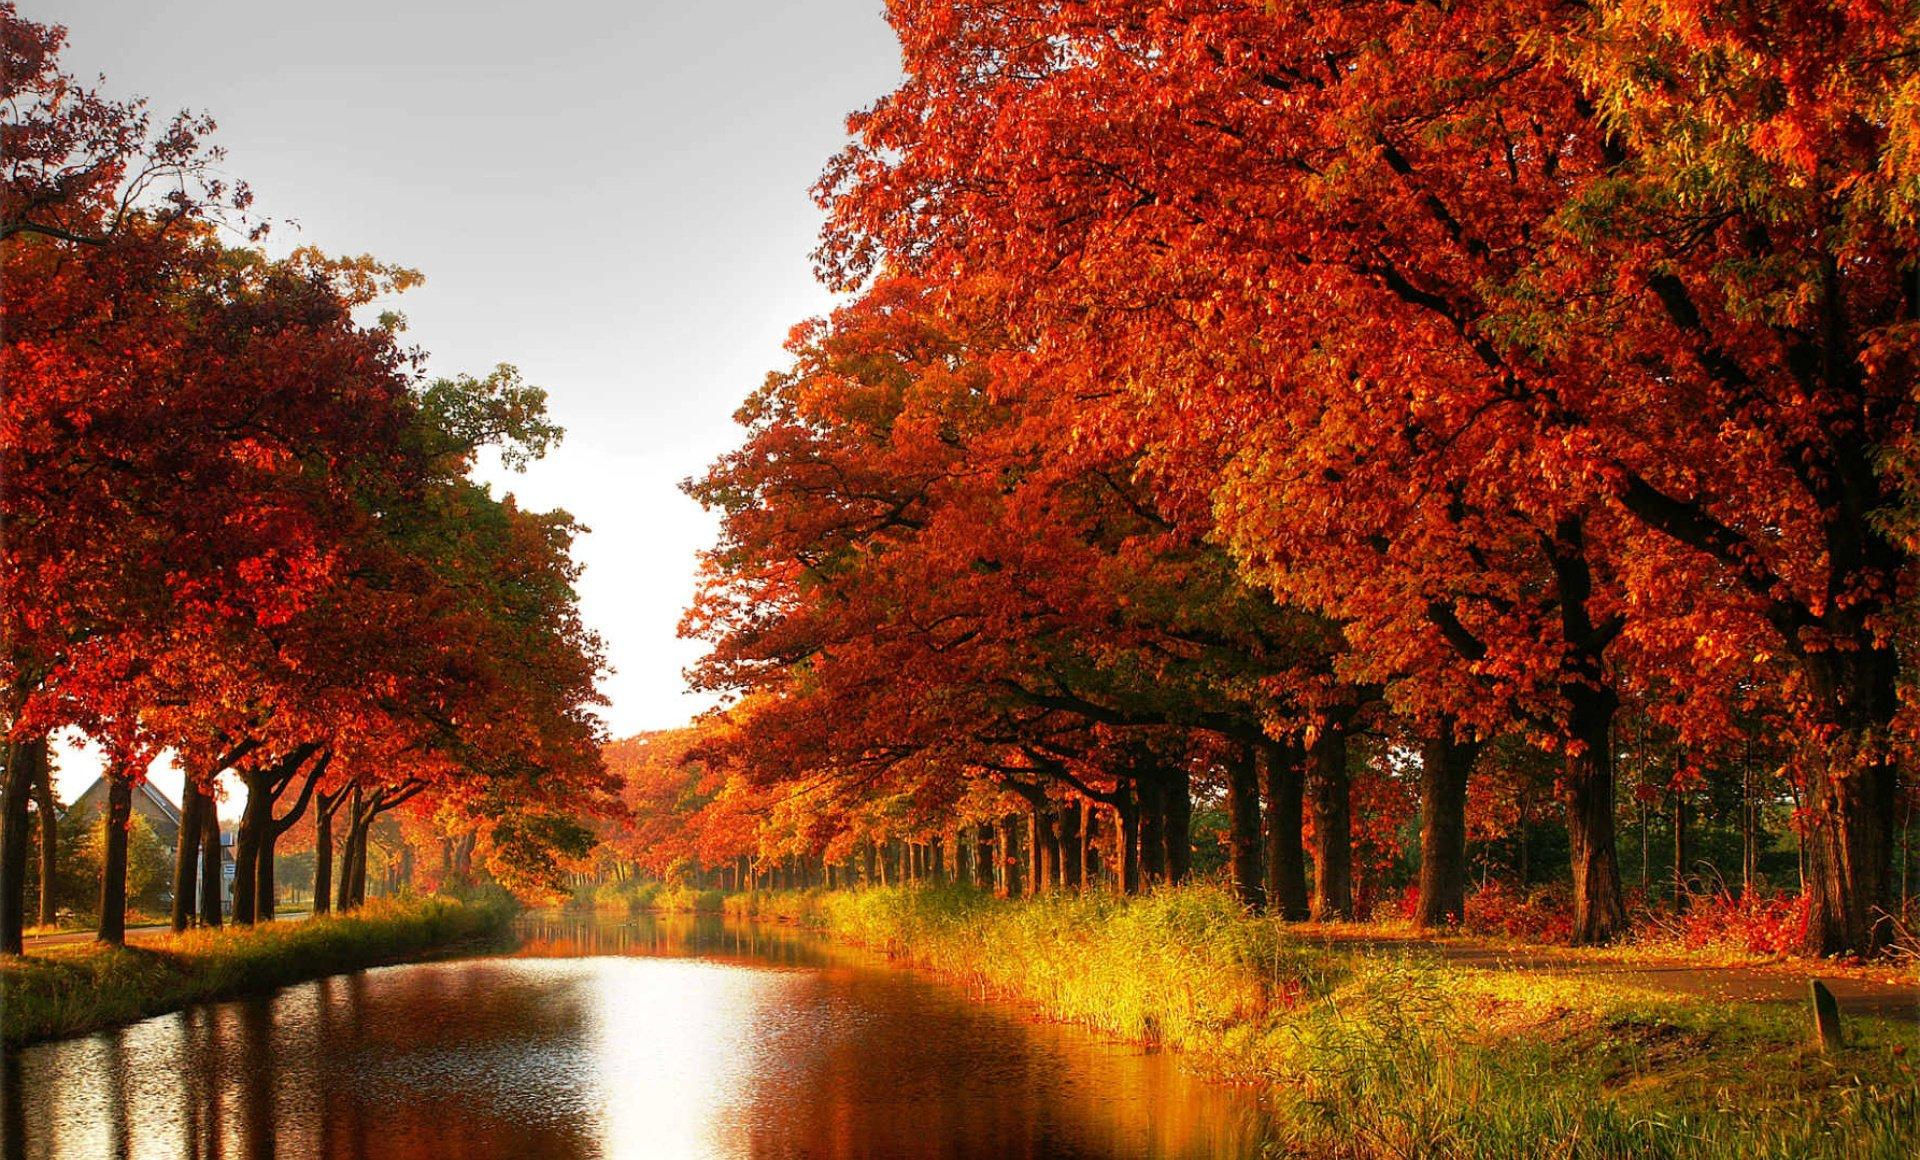 Earth - Fall  River Path Wallpaper